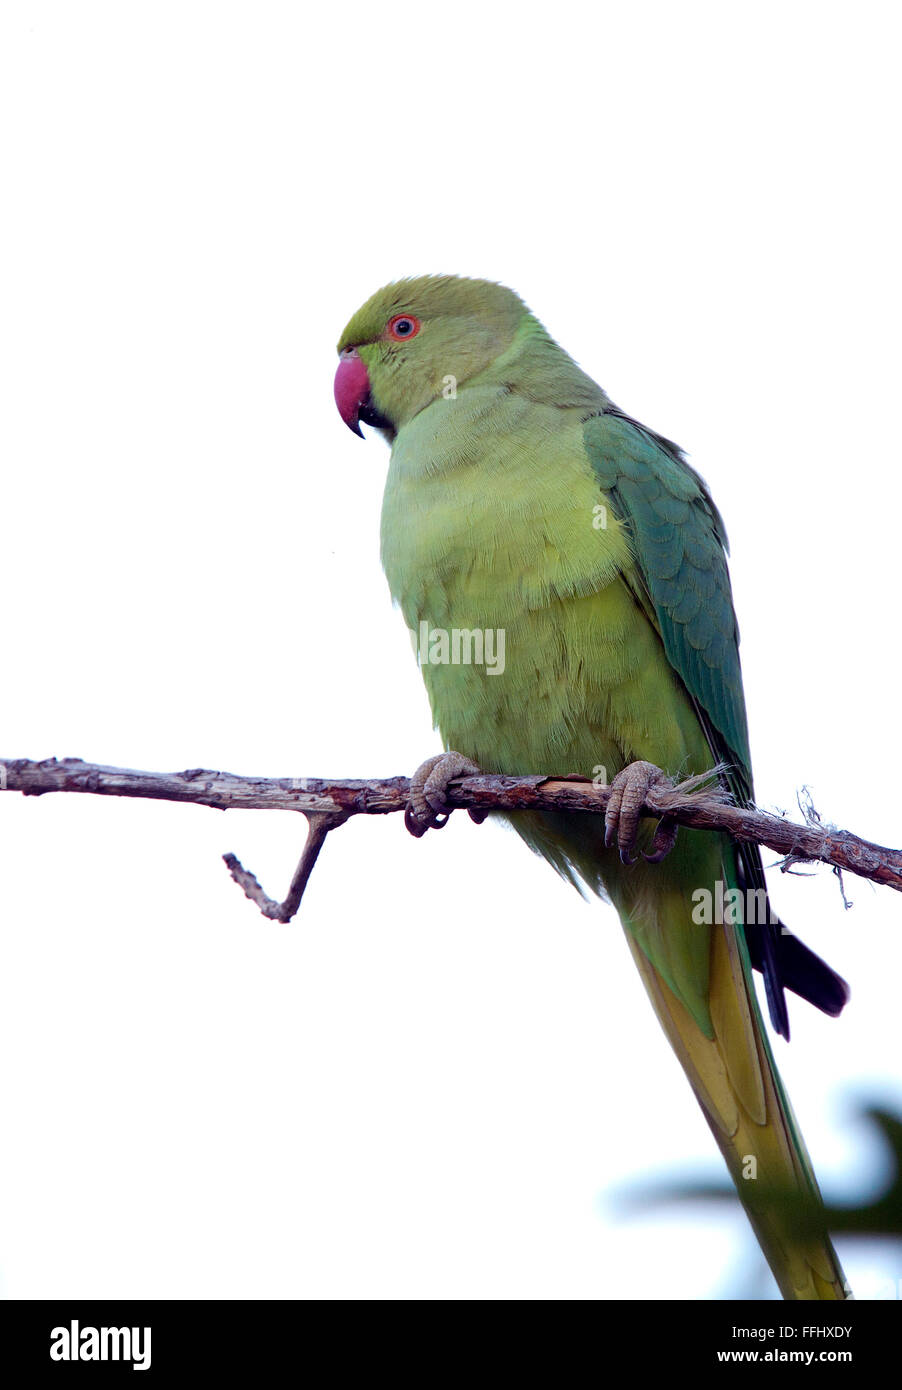 Rose-ringed Parakeet, (Psittacula krameri) an introduced, feral, bird, Tenerife, Canary Islands, Spain. Stock Photo